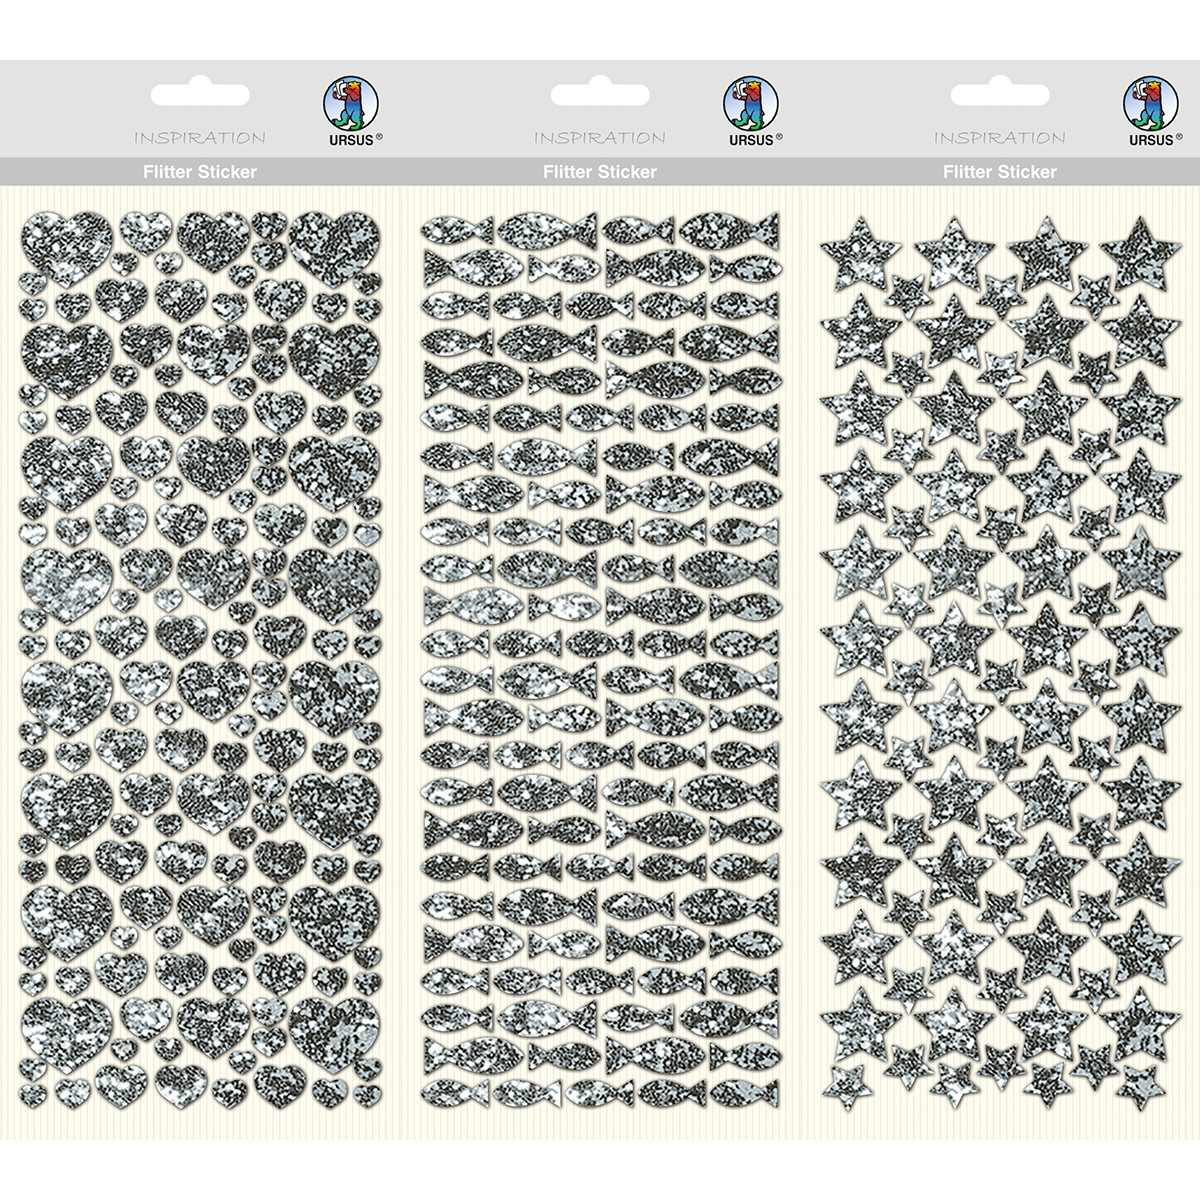 Flitter Sticker, 1 Blatt Folienstoff-Sticker, ca. 12 x 29 cm, selbstklebend, silber